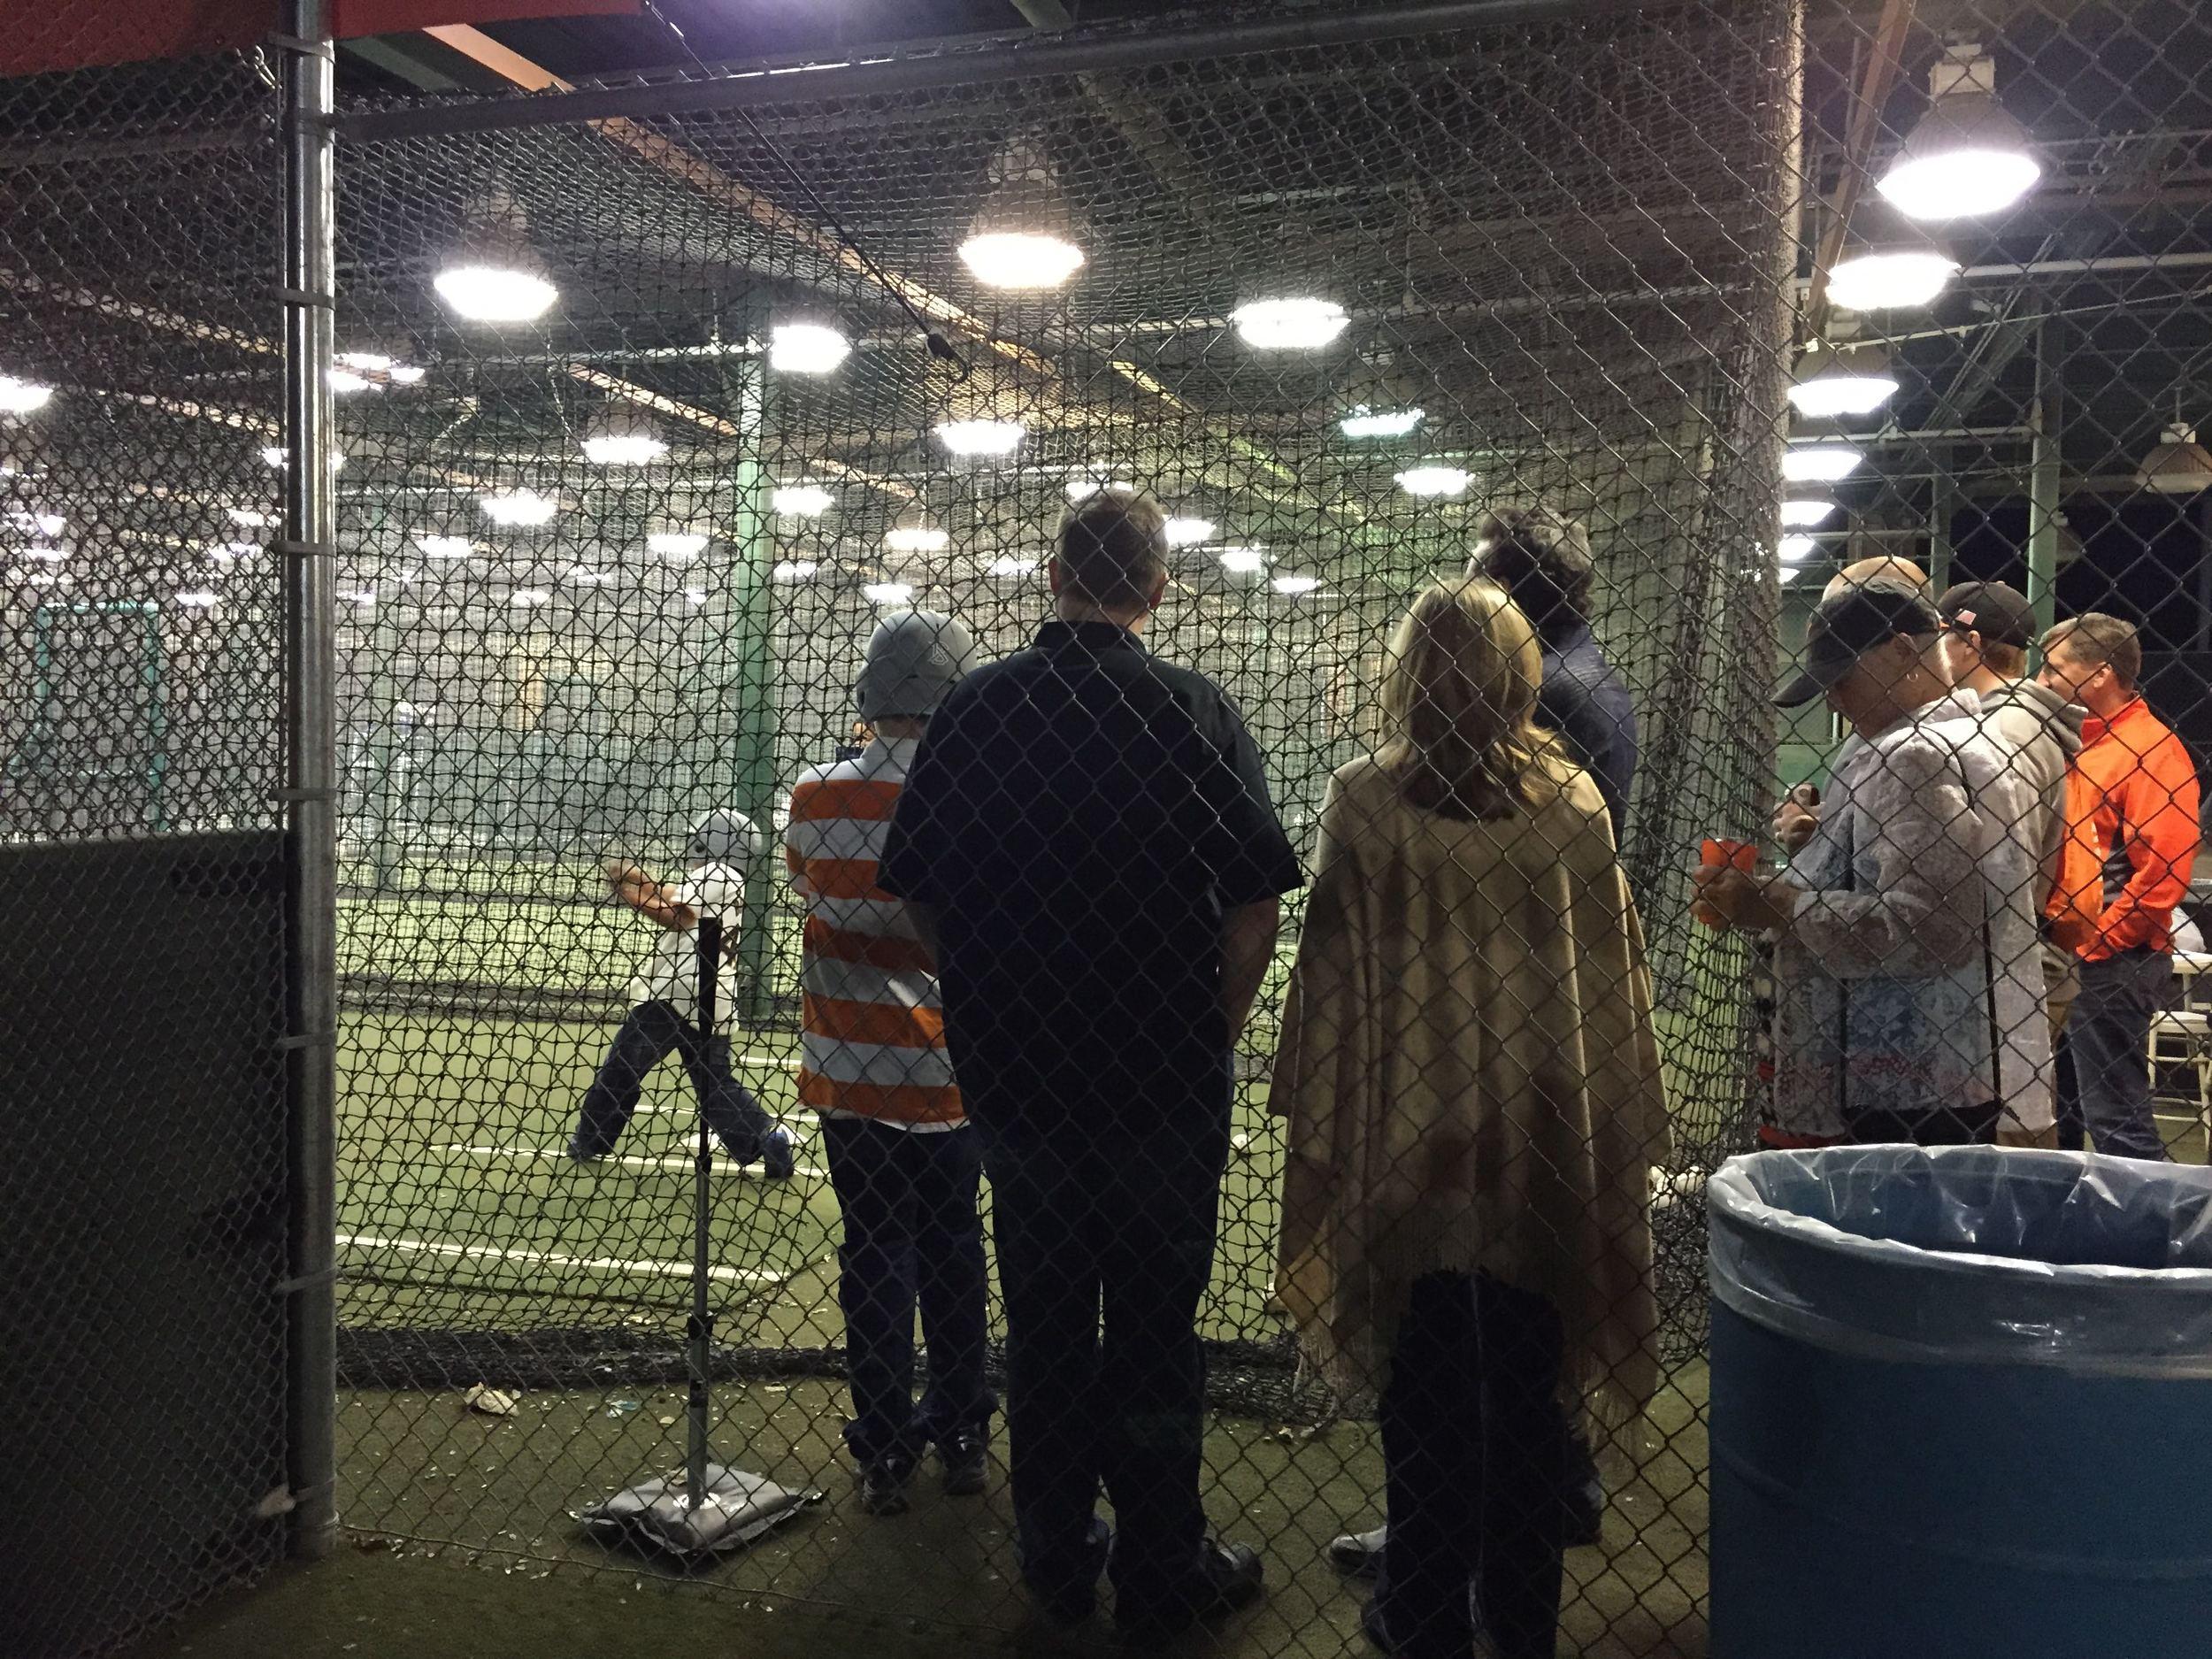 Batting practice anyone?